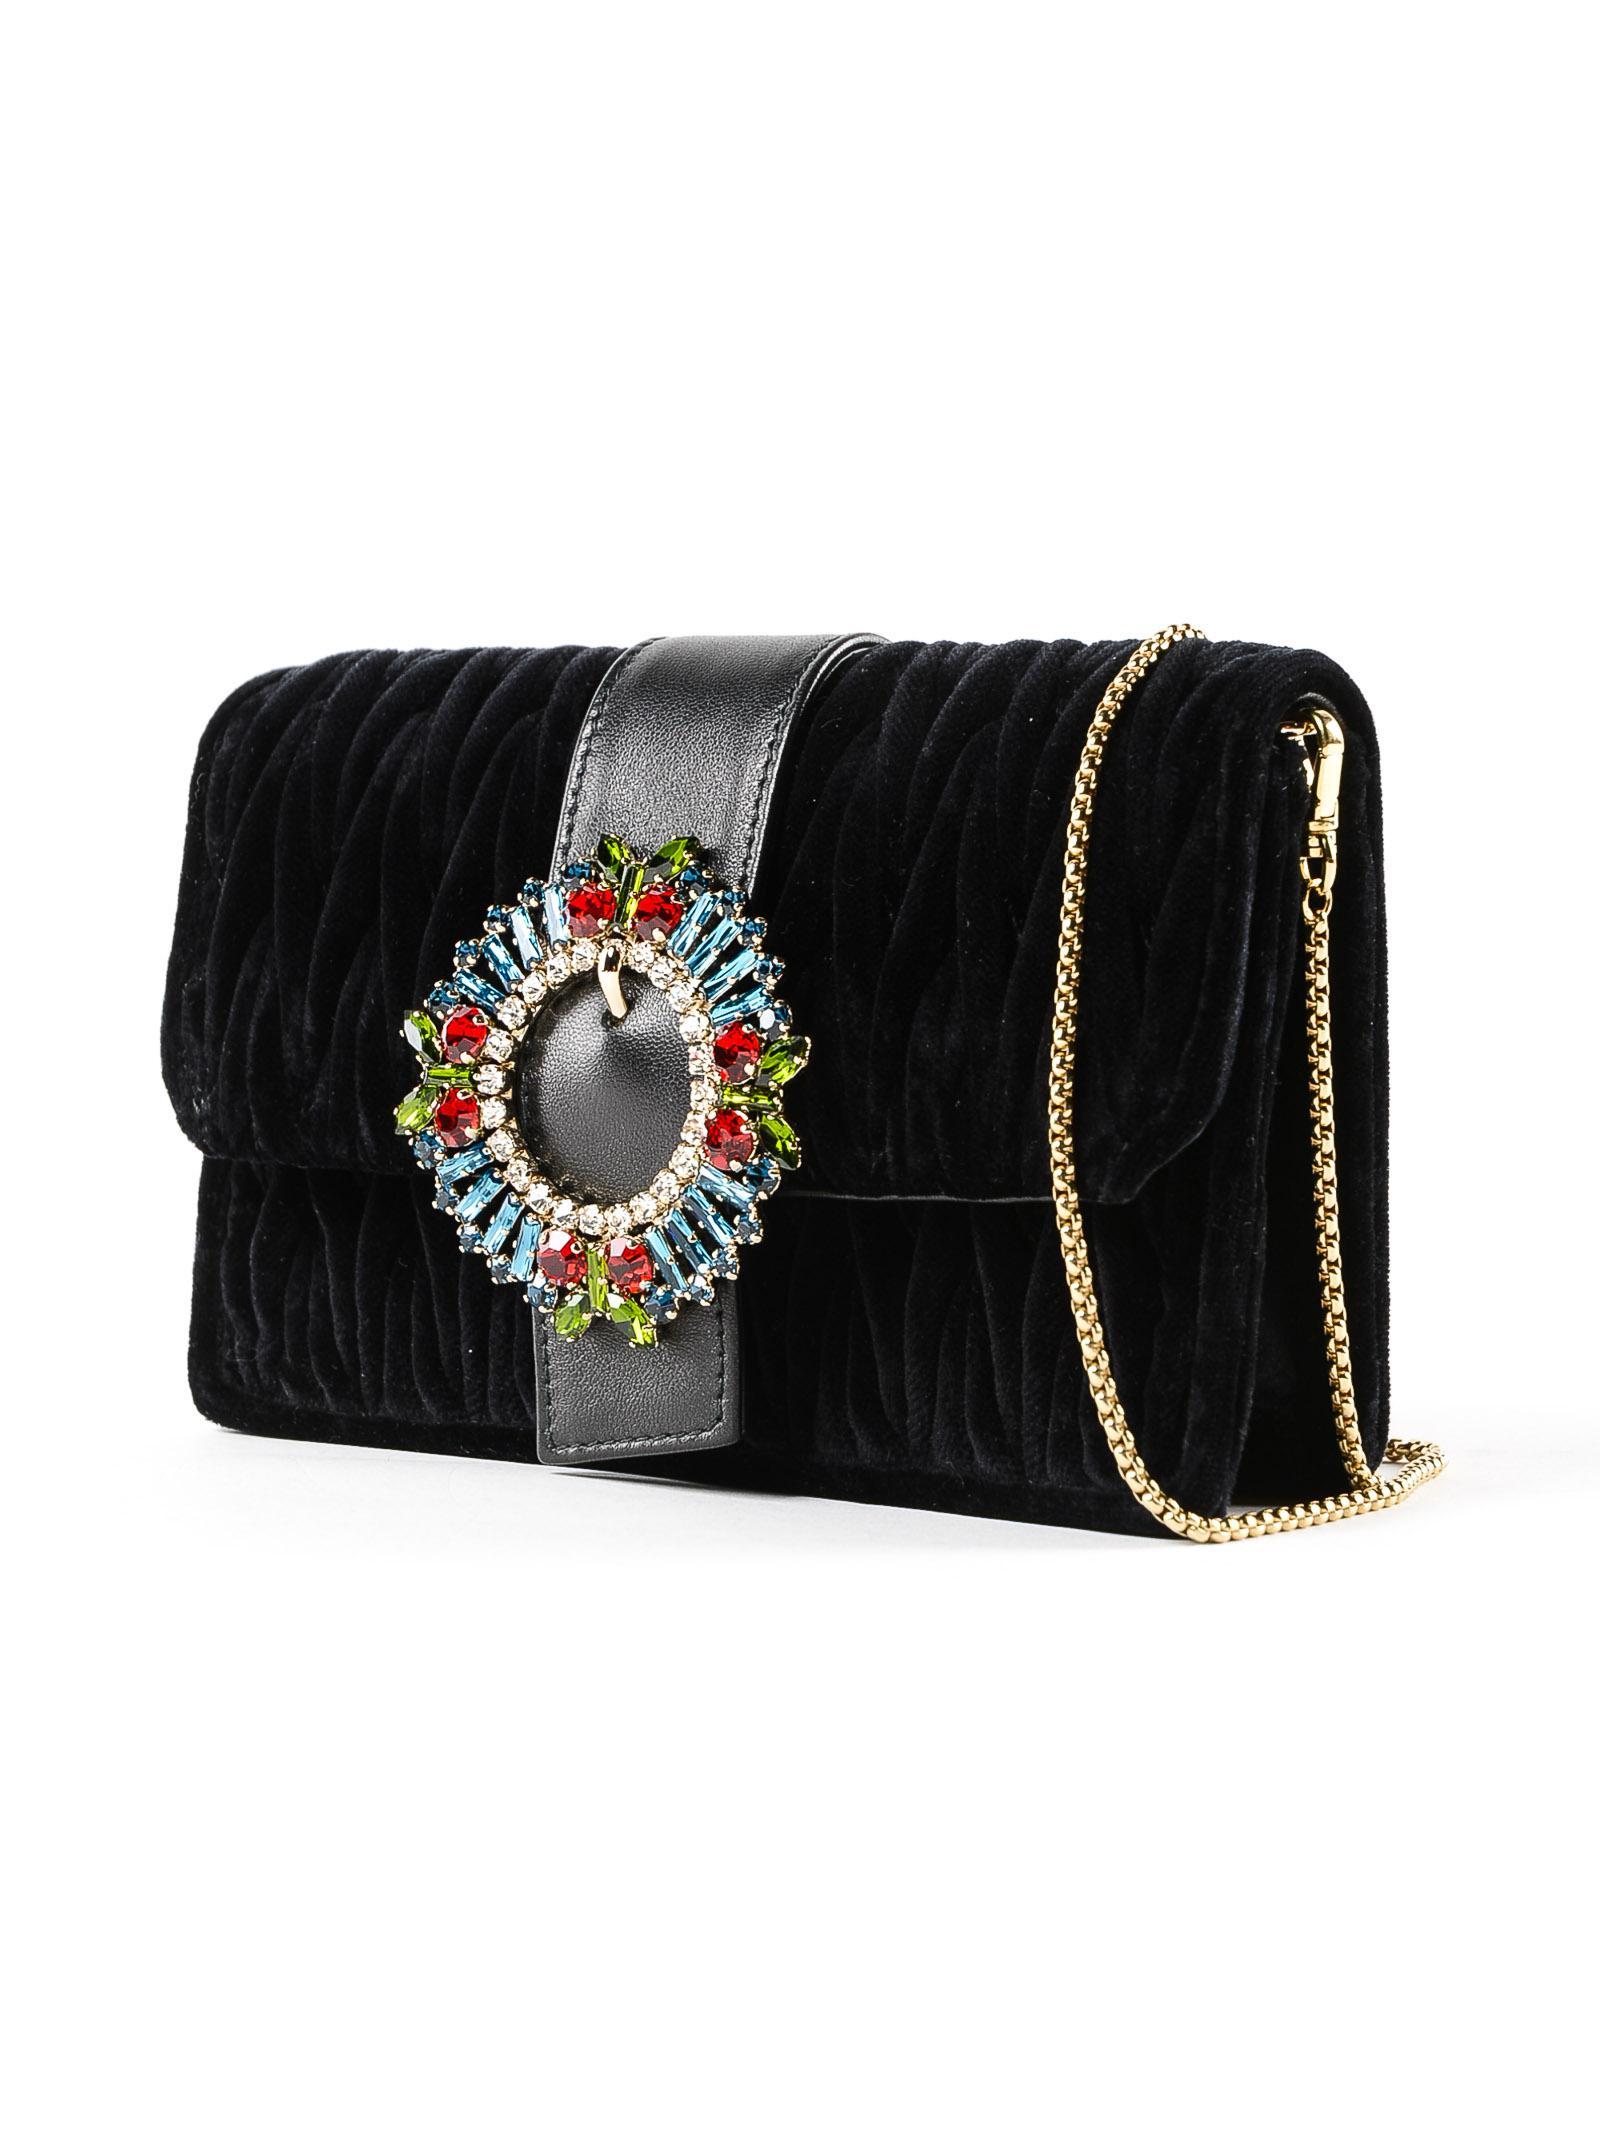 30cf4d8bdbab Miu Miu Velvet Crossbody Bag in Black - Lyst